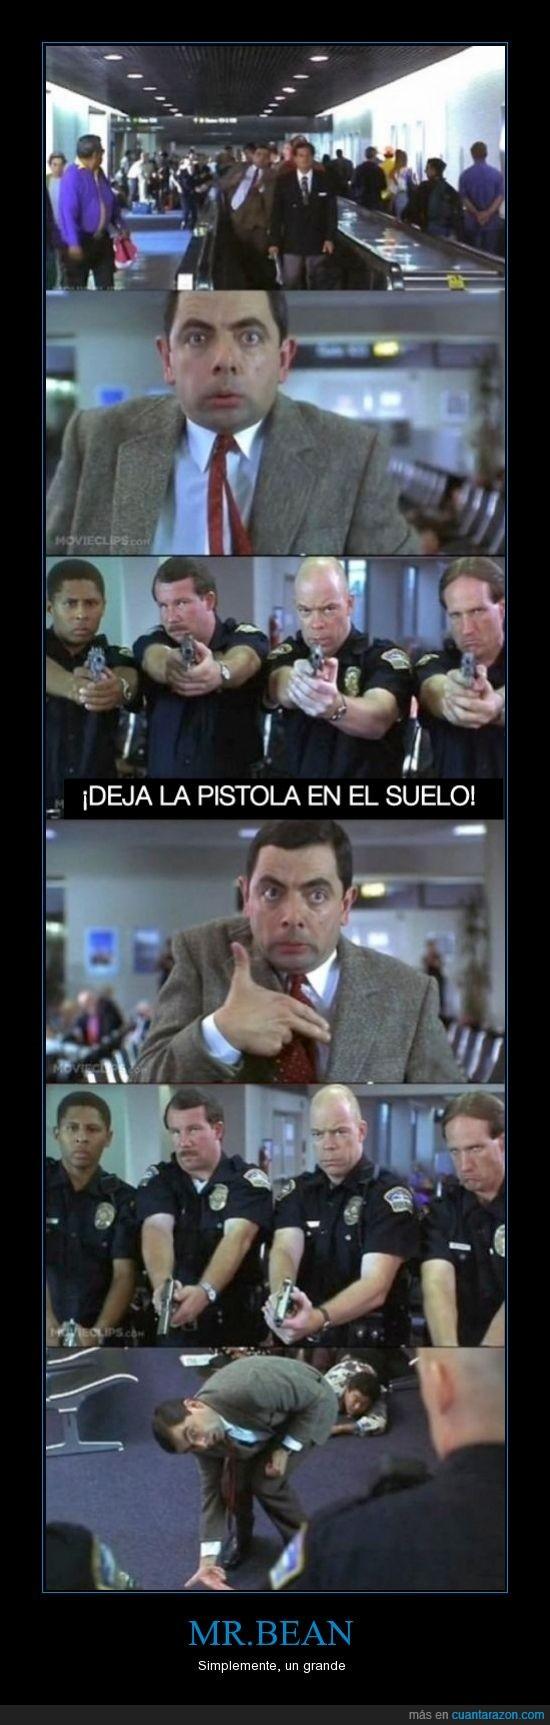 Aeropuerto,Humor,mano,MR.Bean,Pistola,policia